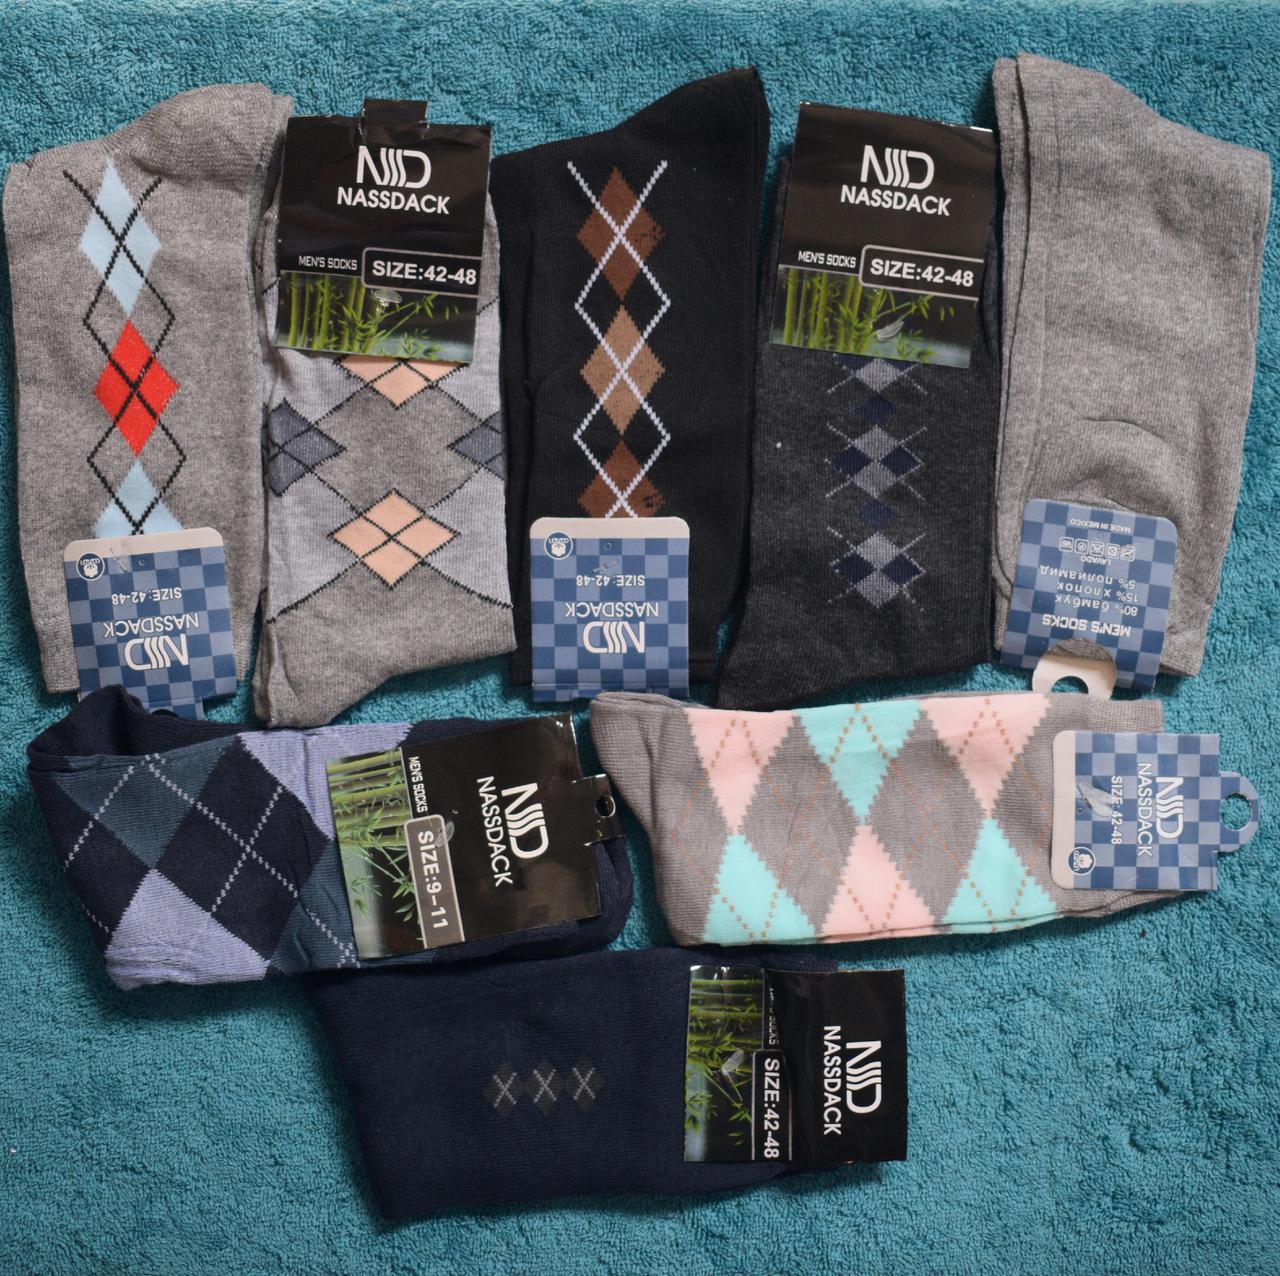 Мужские носки Nassdack AV40-7. В упаковке 12 пар